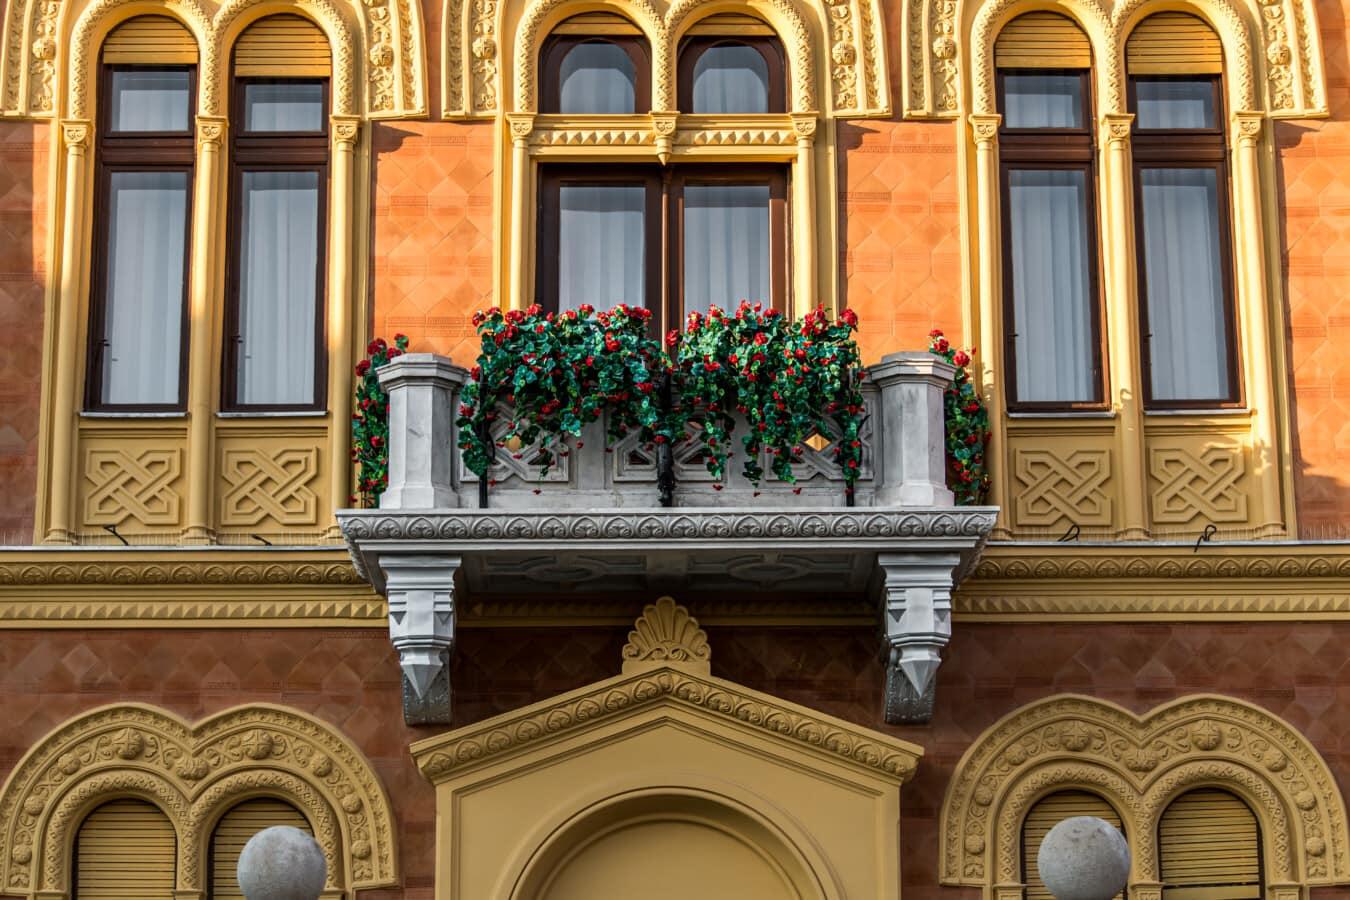 Balkon, Palast, Haus, Residenz, fenster, Barock, Architektur, Fassade, alt, Fenster